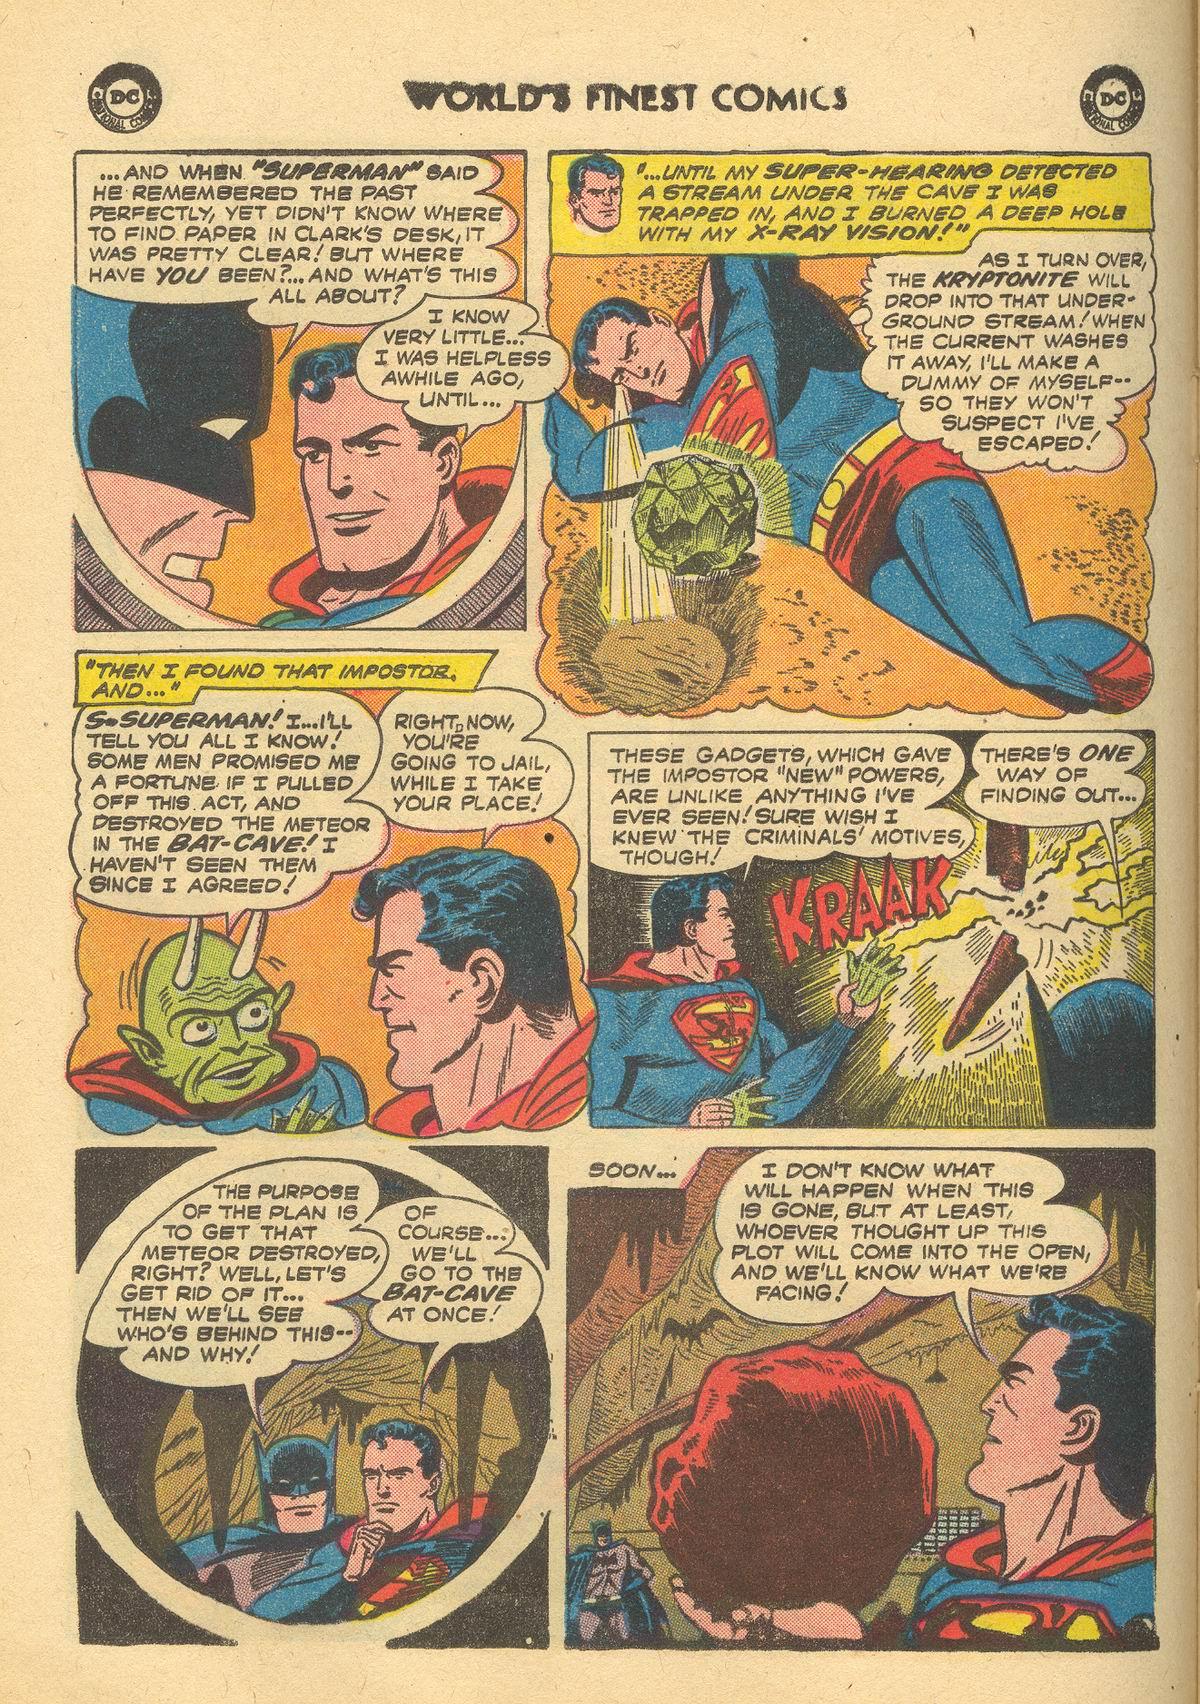 Read online World's Finest Comics comic -  Issue #105 - 12